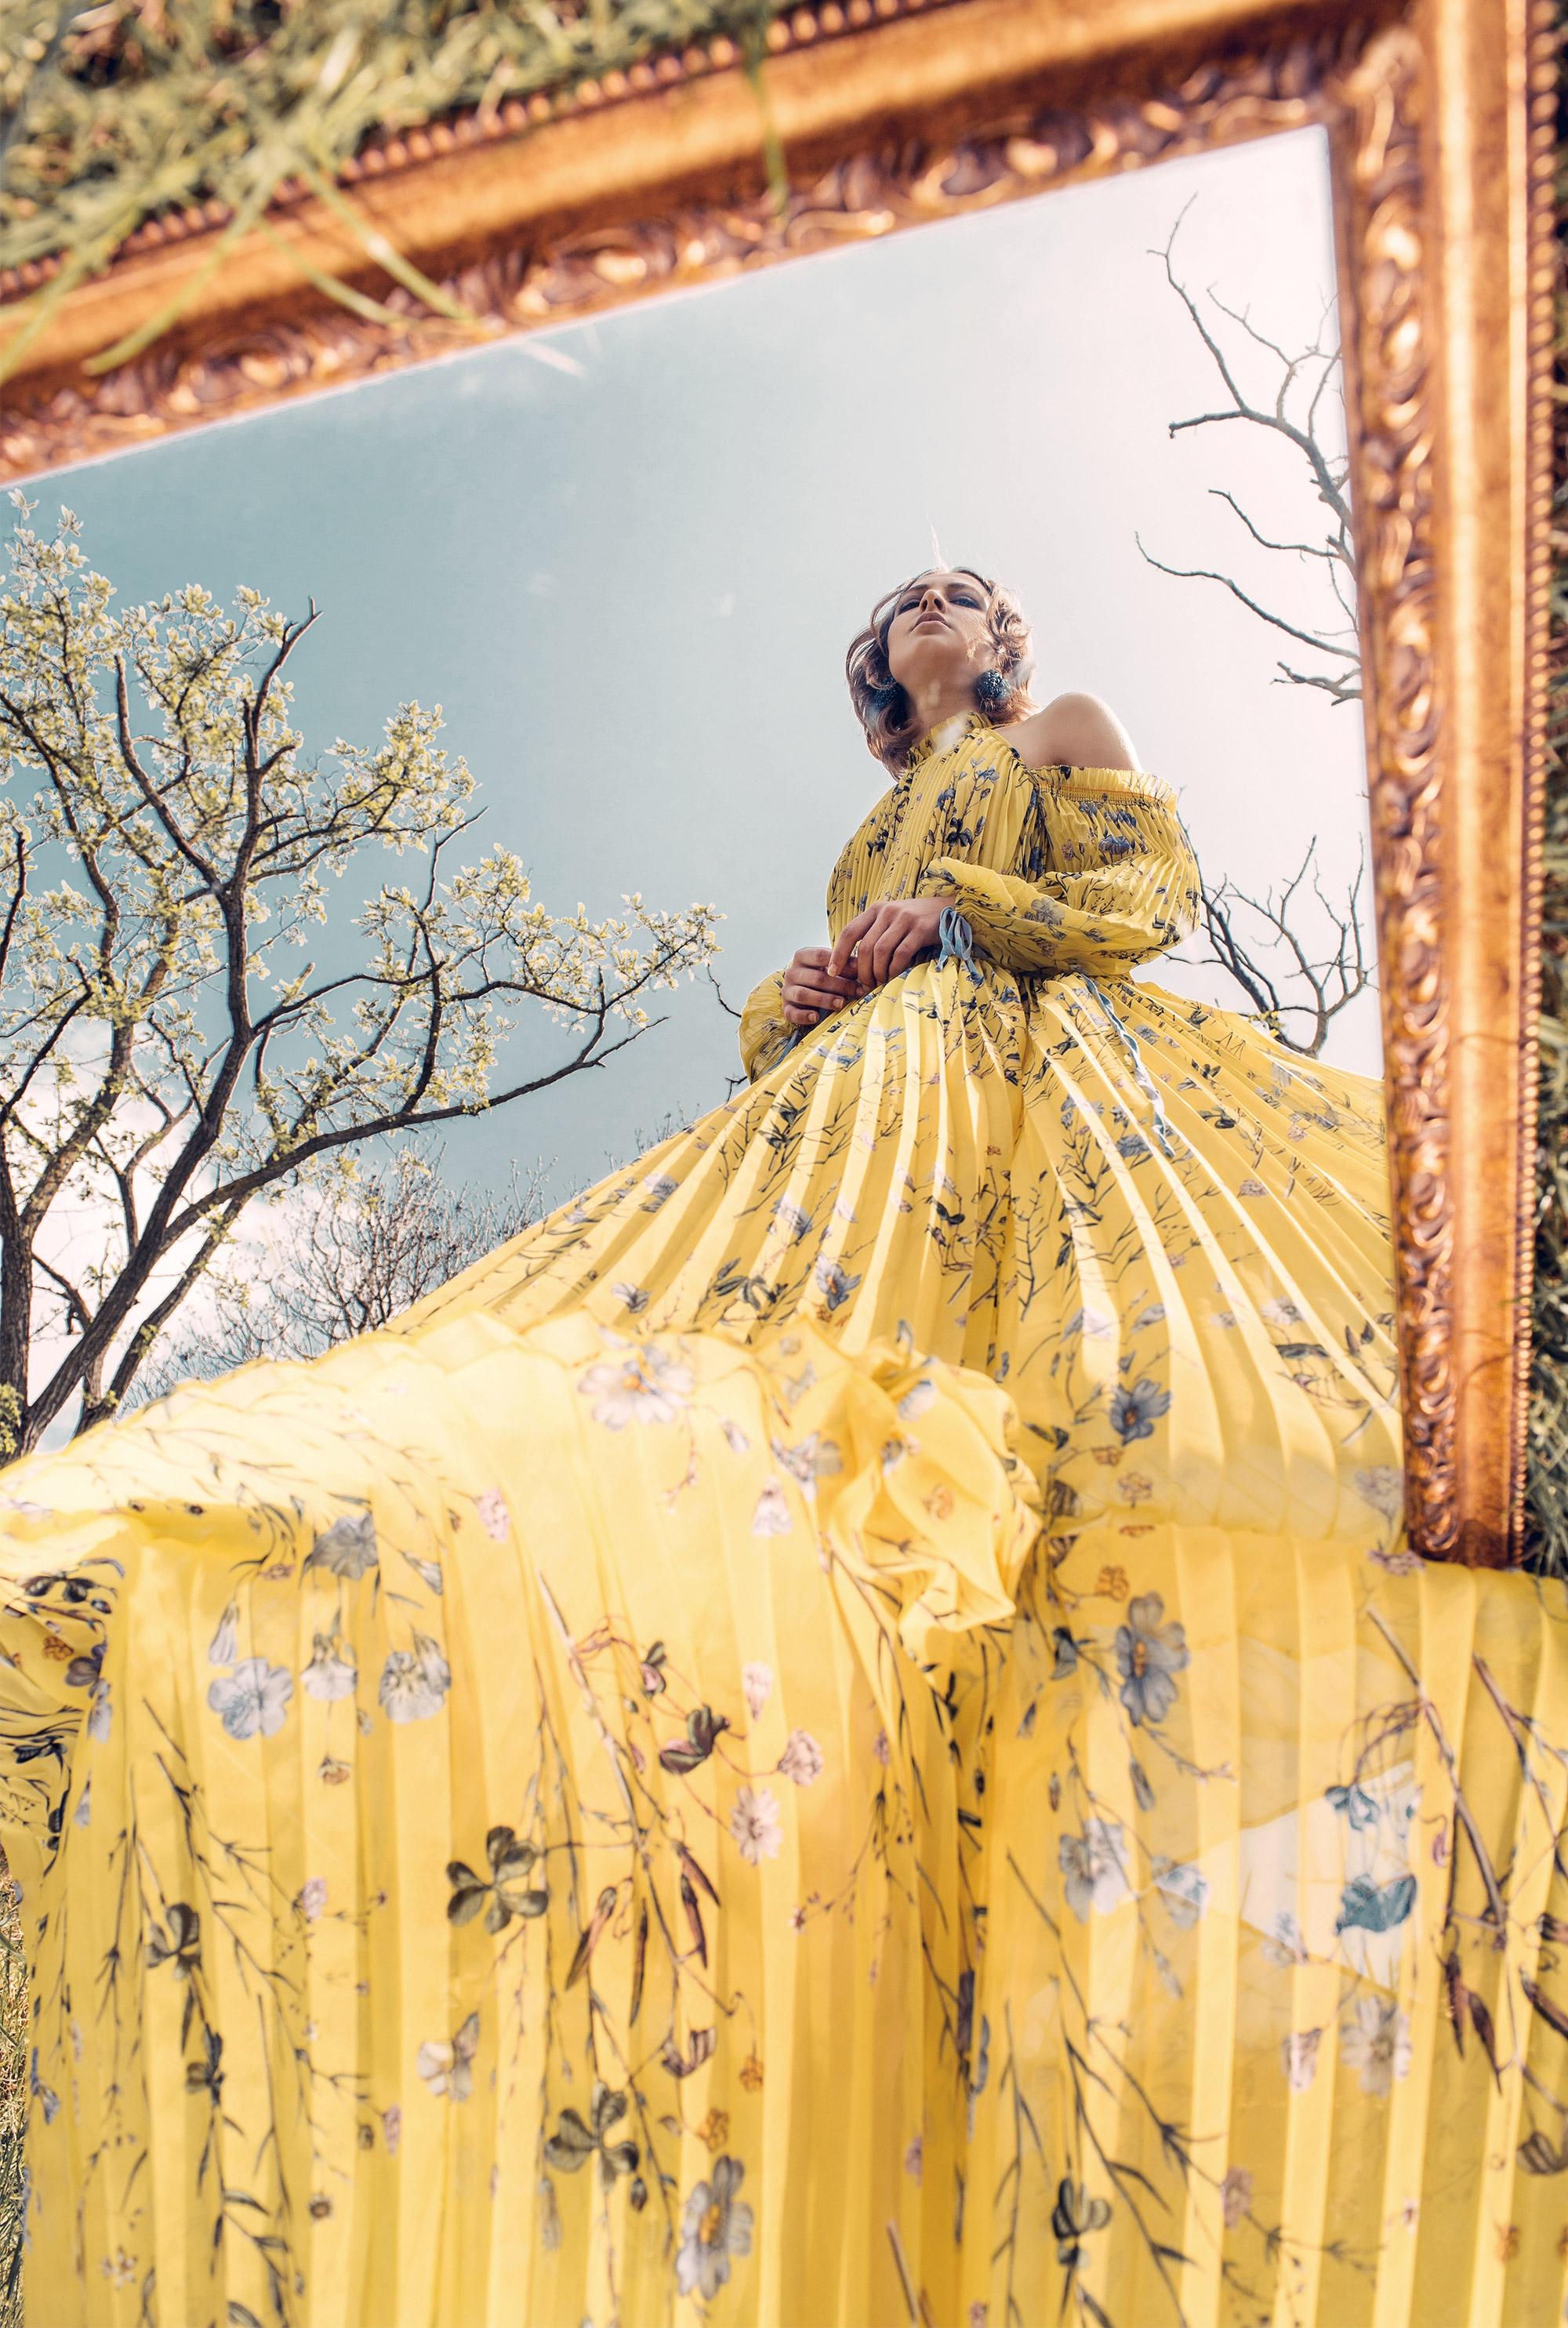 self-portrait-dress-mrselfportrait-selfportrait-vestito-floreale-ss18-leamroma-editoriale